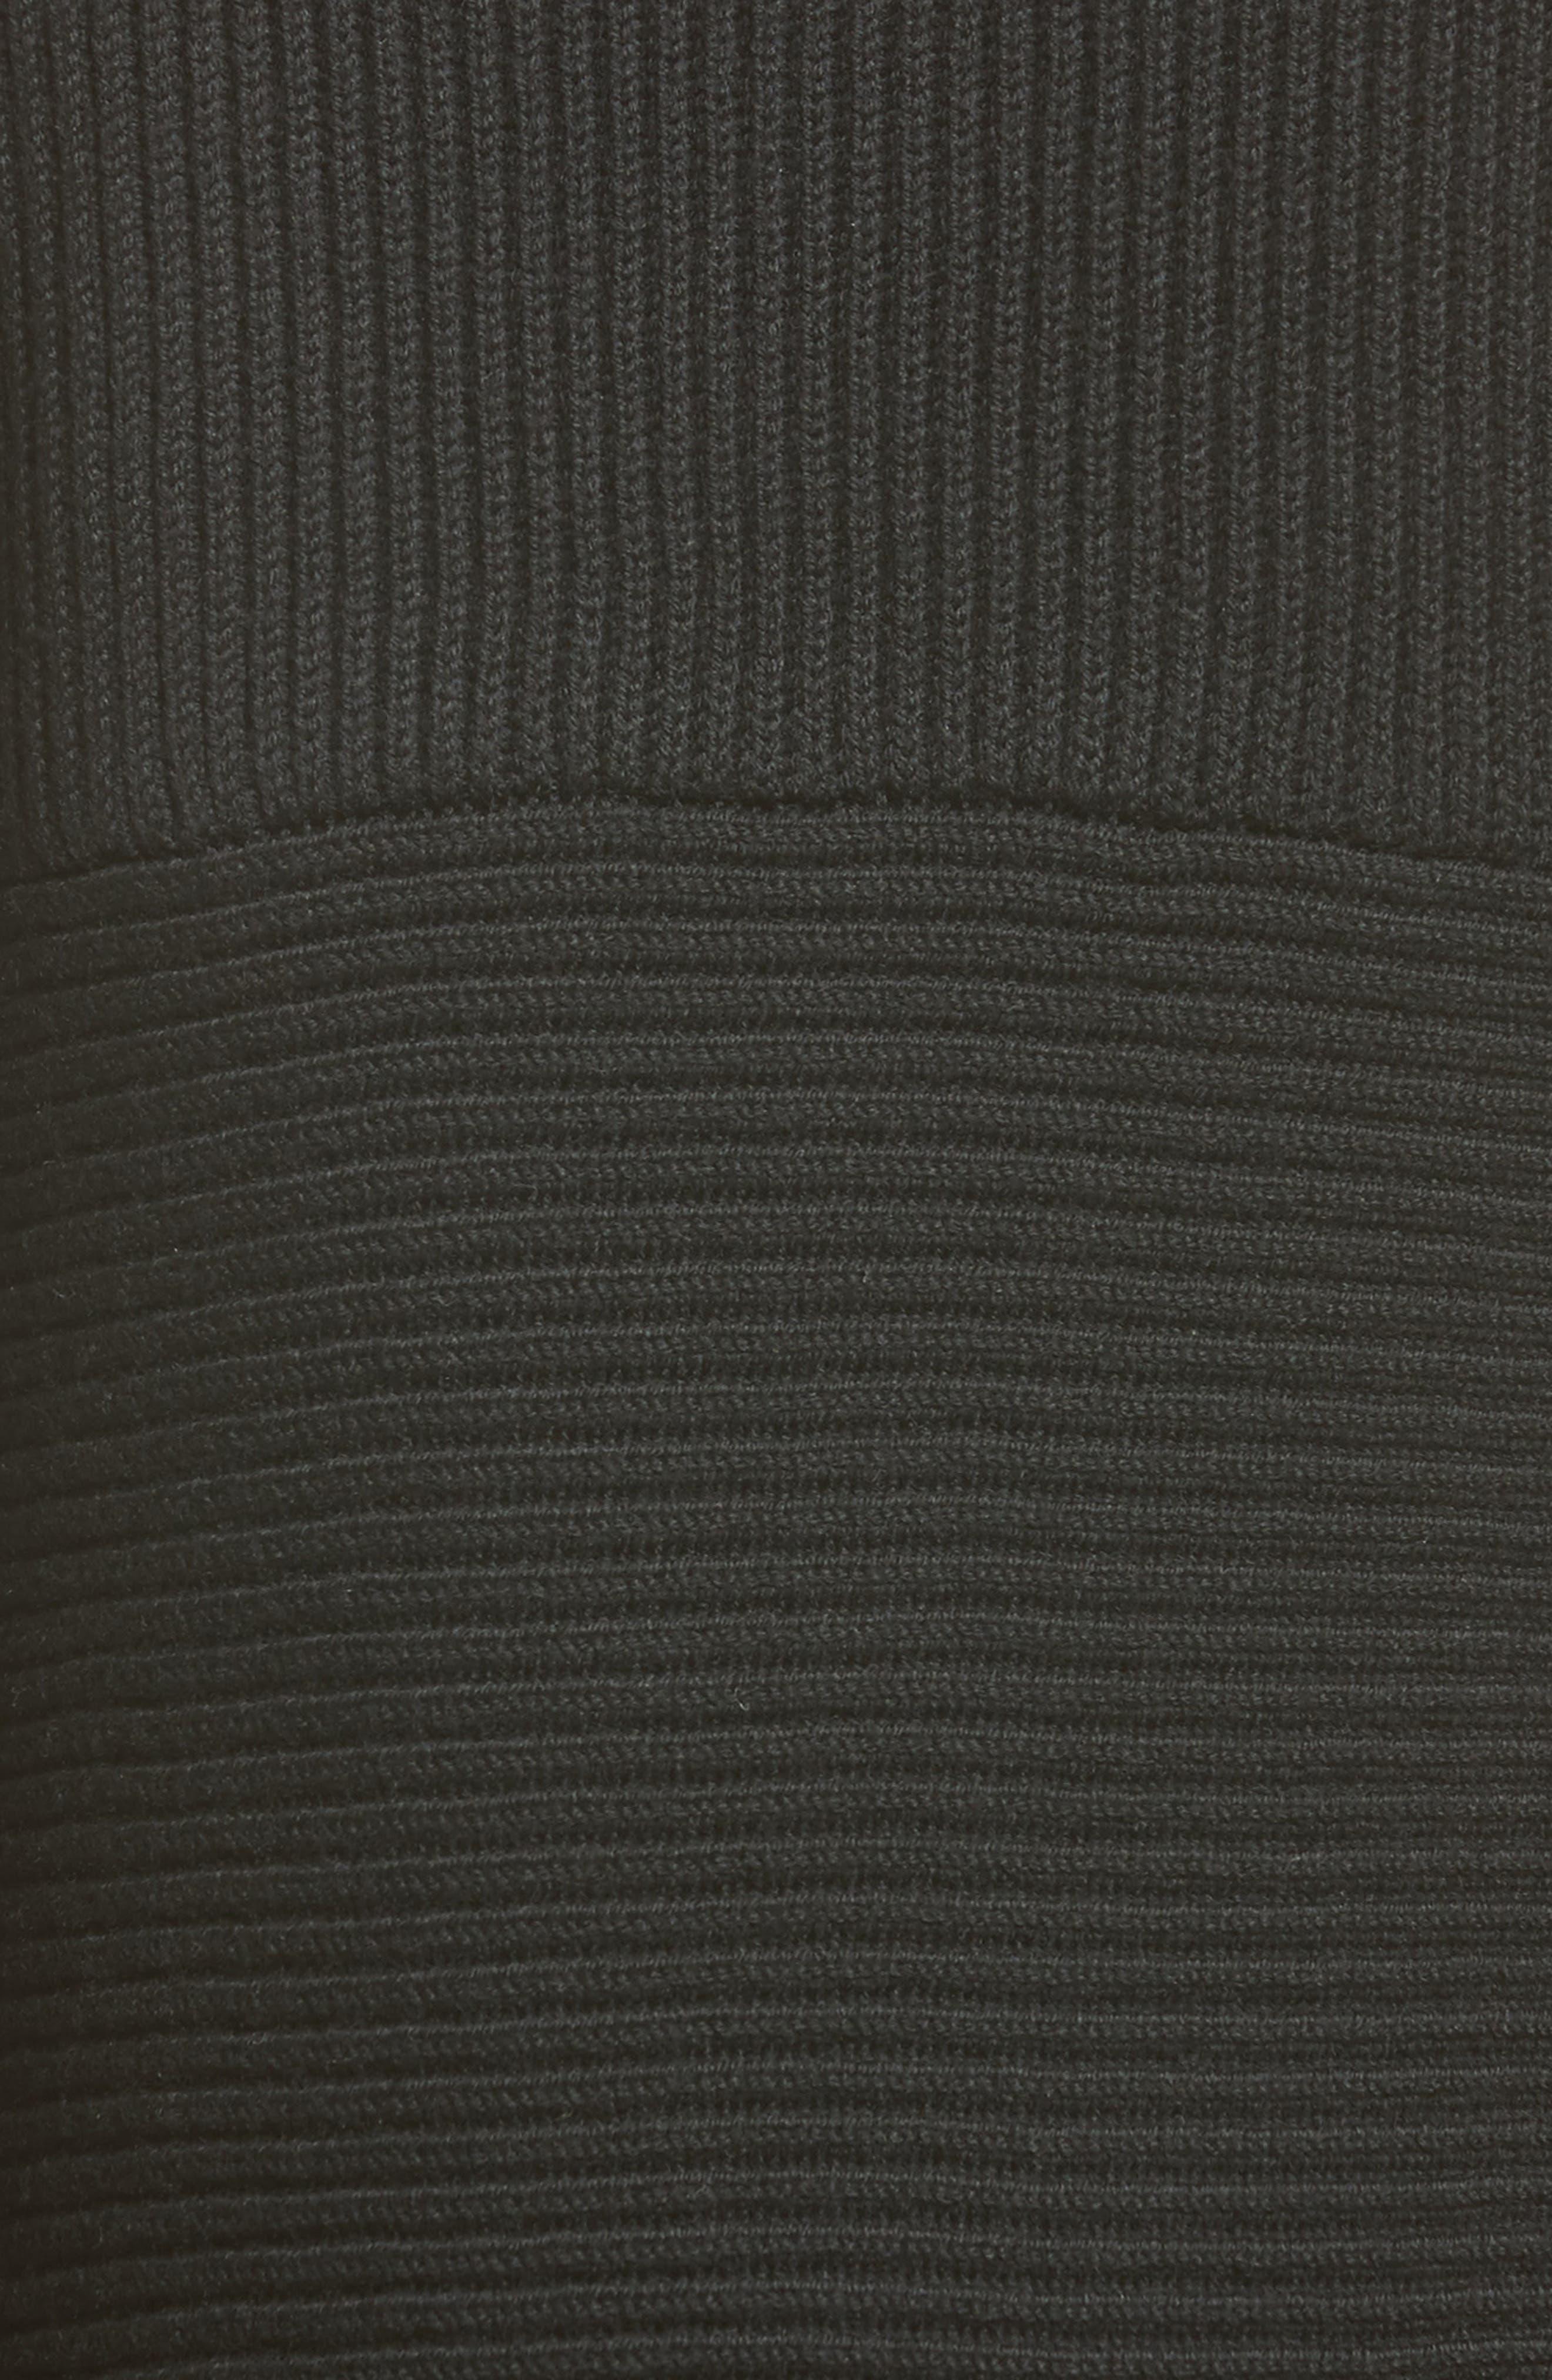 Virgin Wool Rib Knit Dress,                             Alternate thumbnail 5, color,                             001